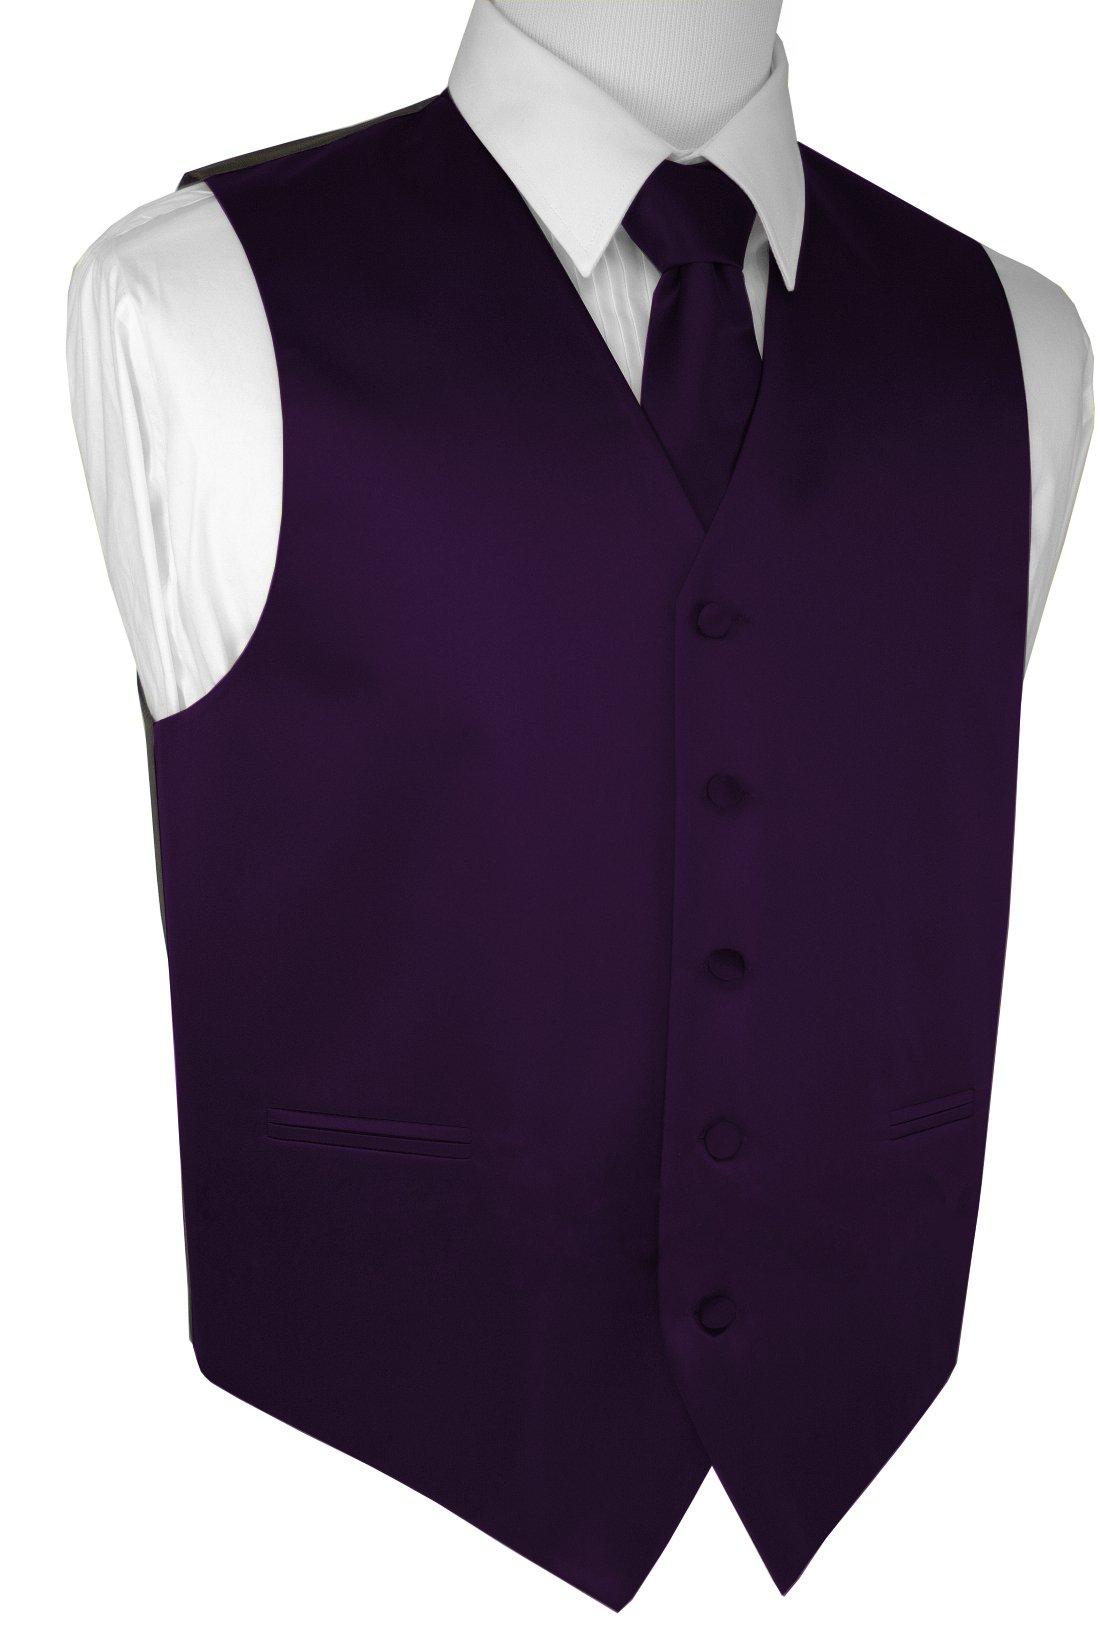 Brand Q Men's Formal Prom Wedding Tuxedo Vest, Tie & Pocket Square Set-Lapis-M